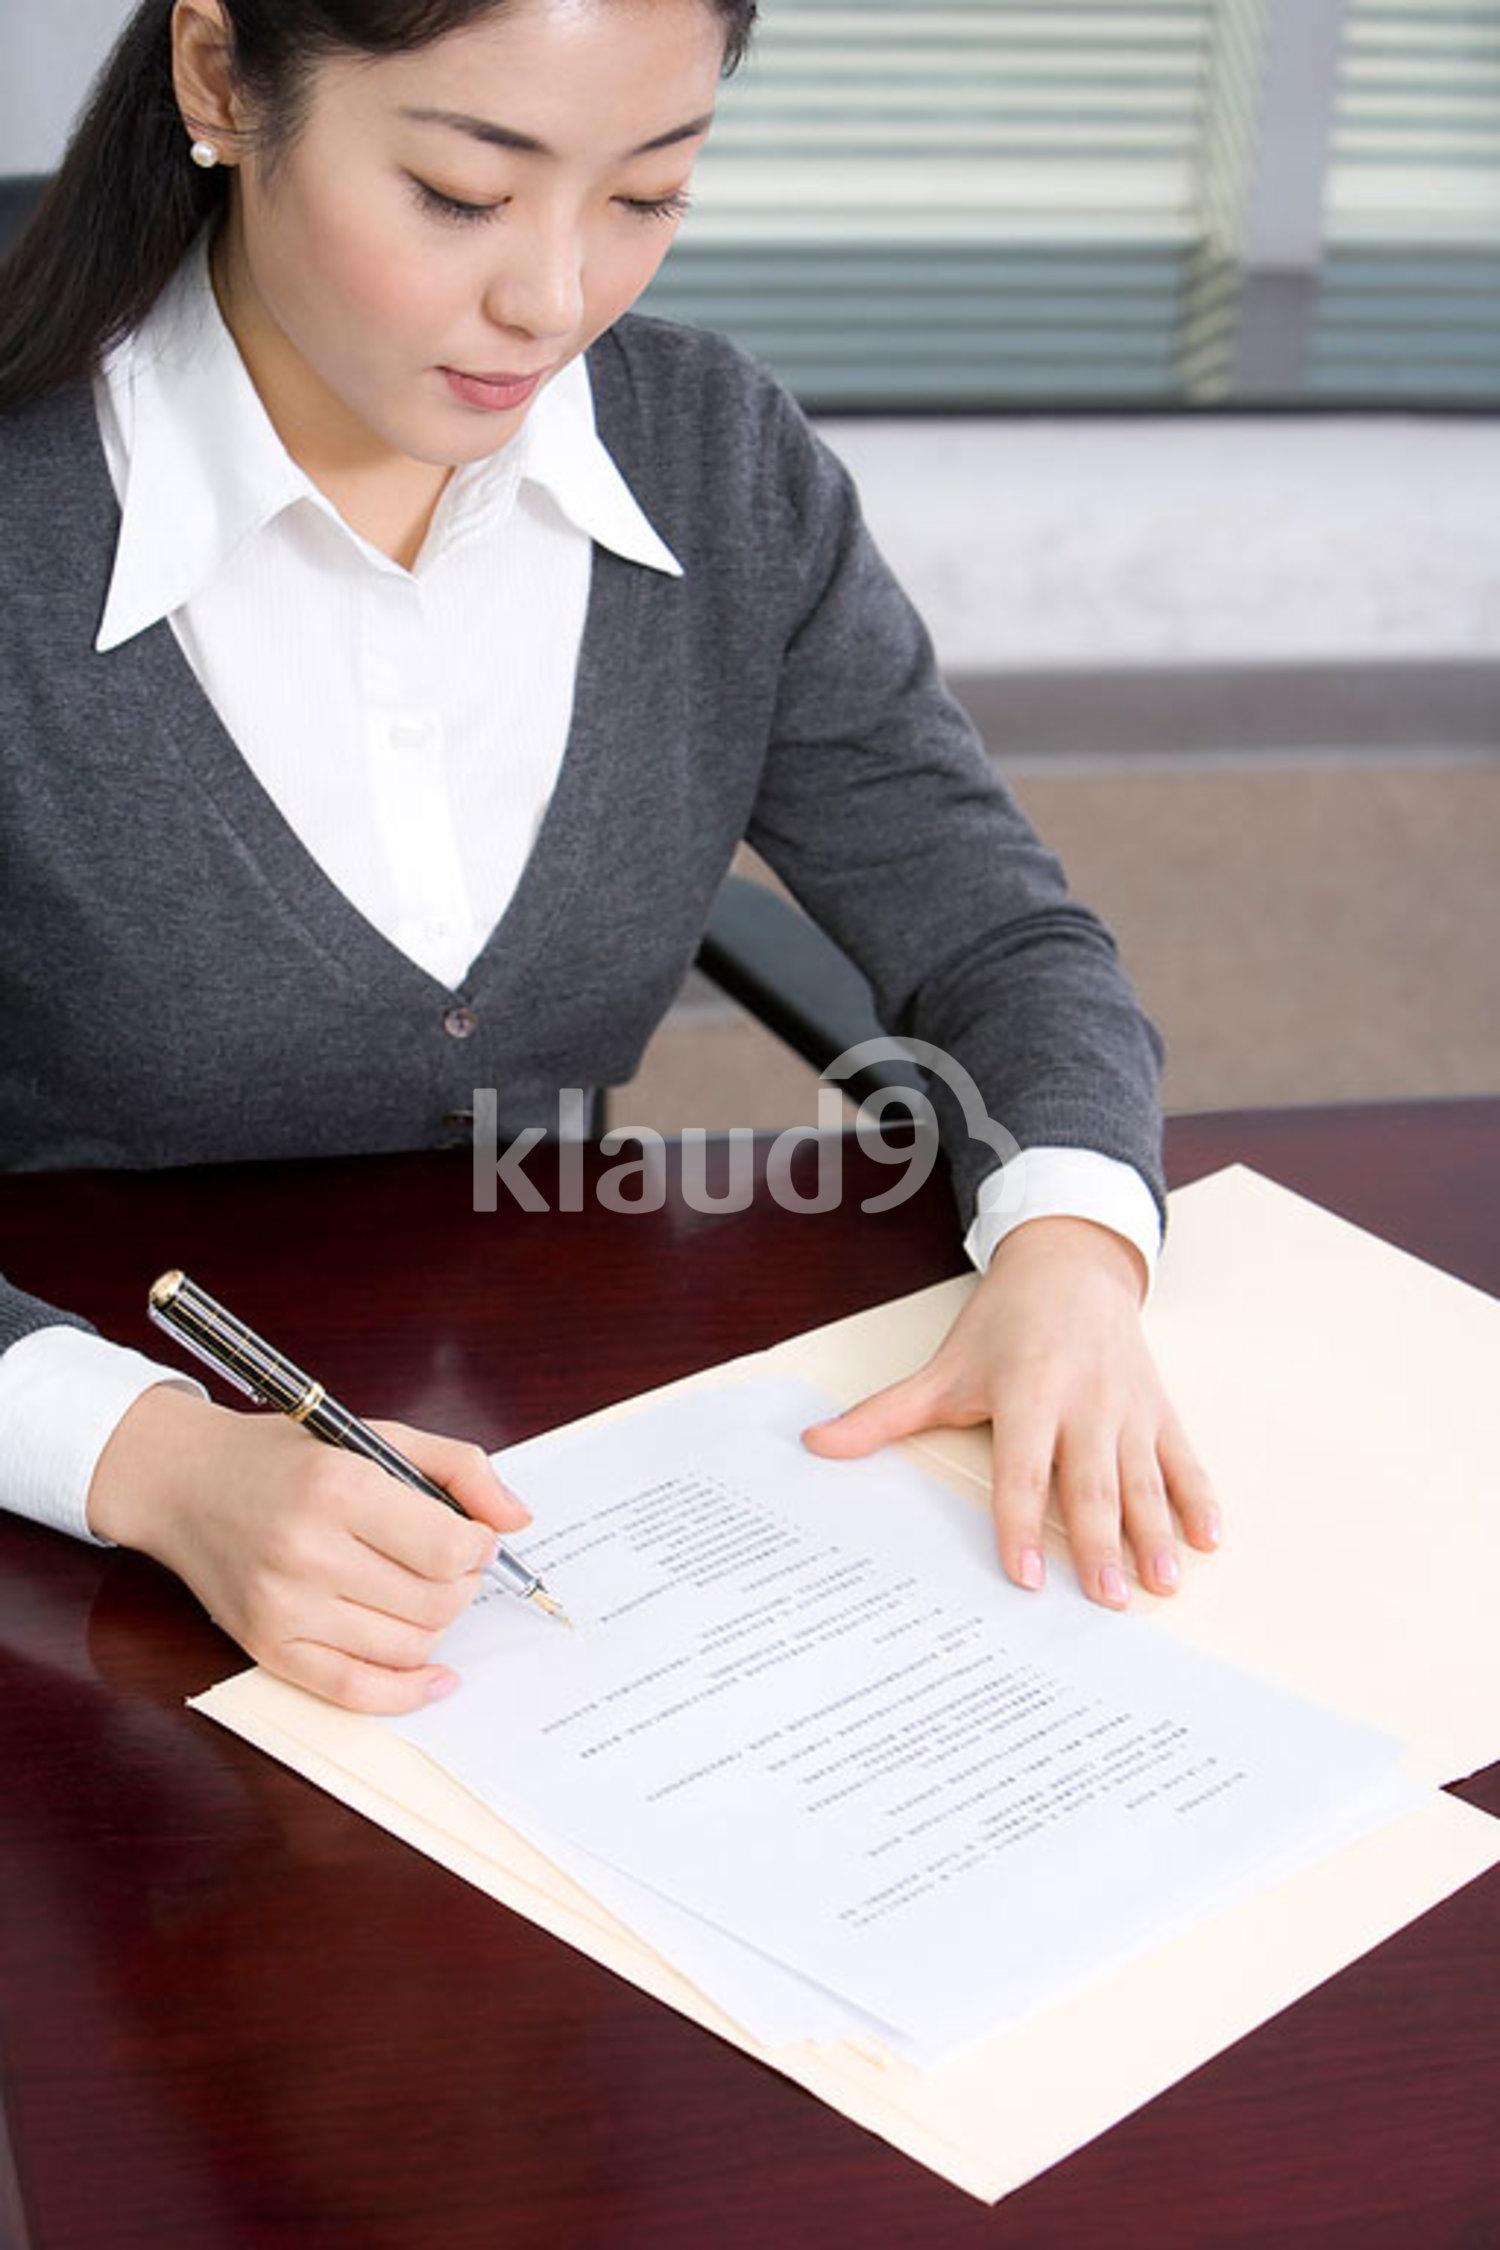 Chinese businesswoman working